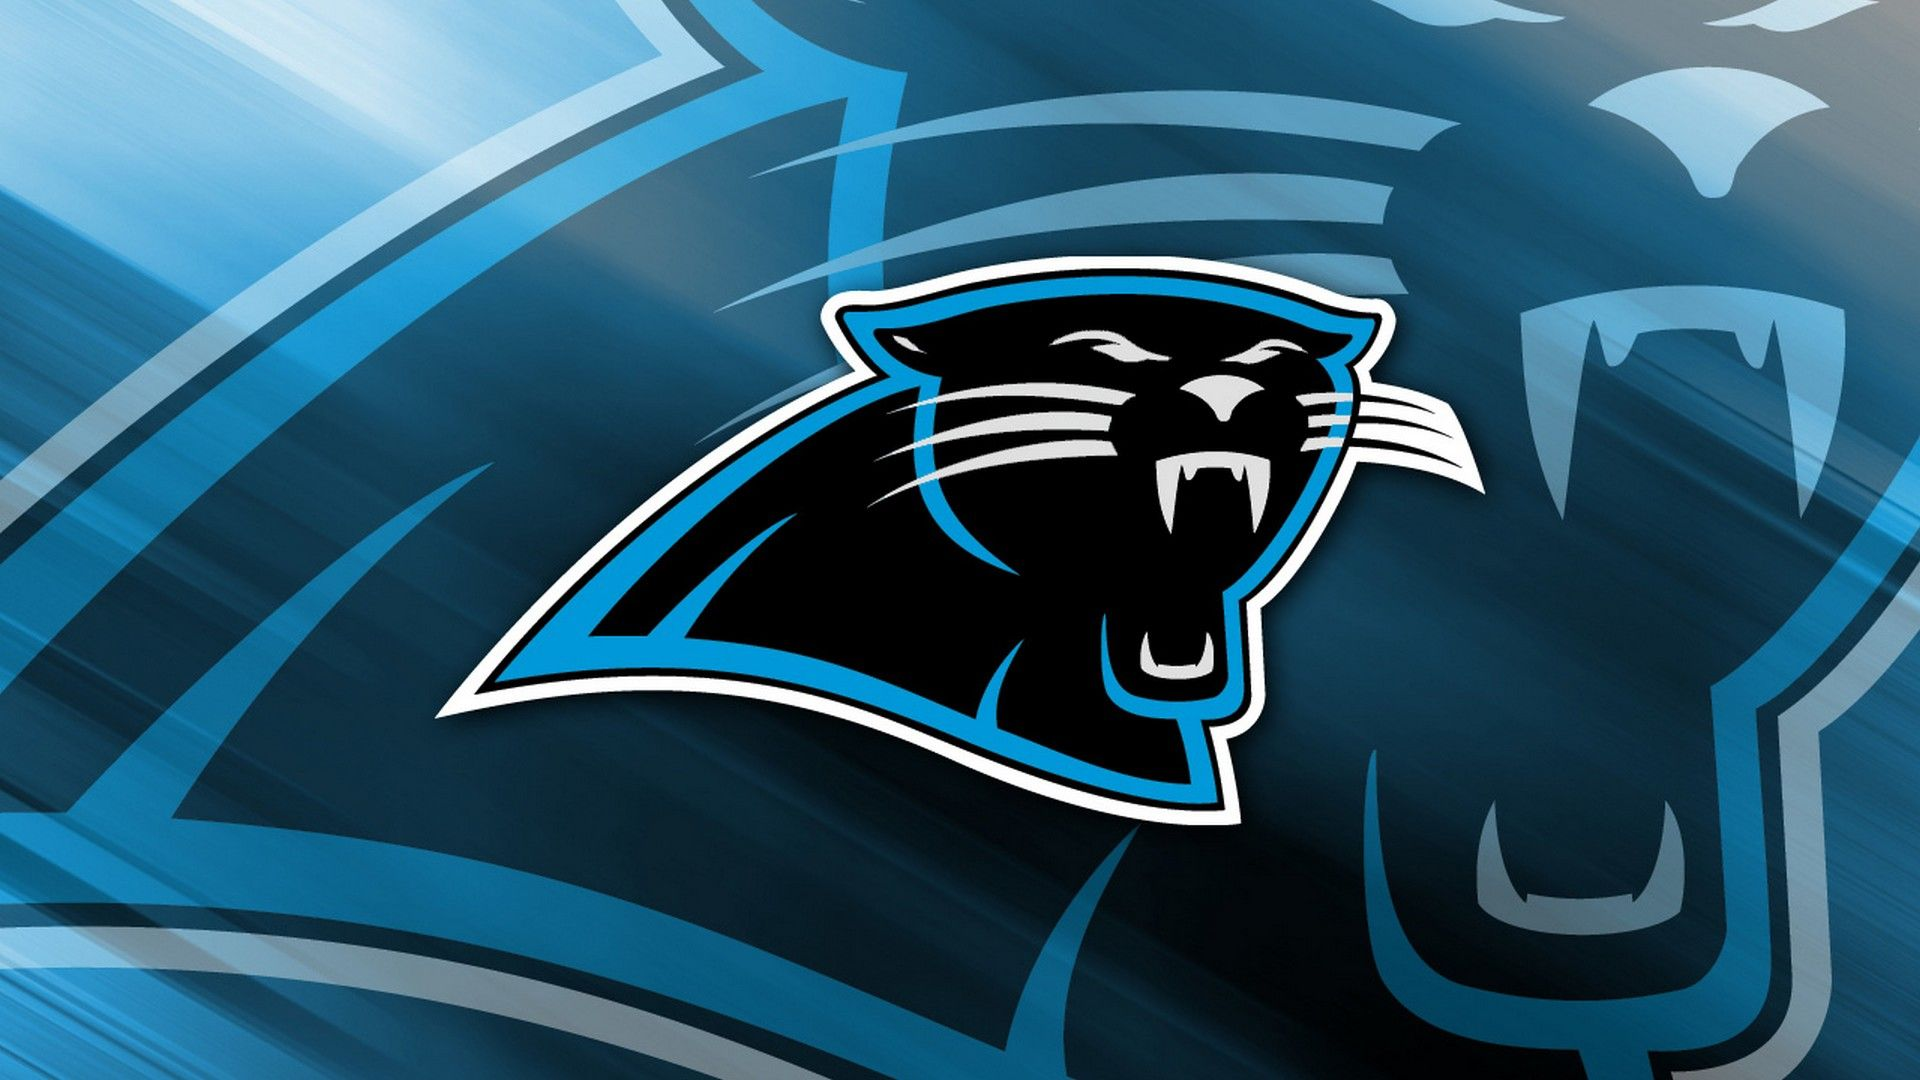 Hd Carolina Panthers Wallpapers 2021 Nfl Football Wallpapers Carolina Panthers Logo Carolina Panthers Football Carolina Panthers Wallpaper